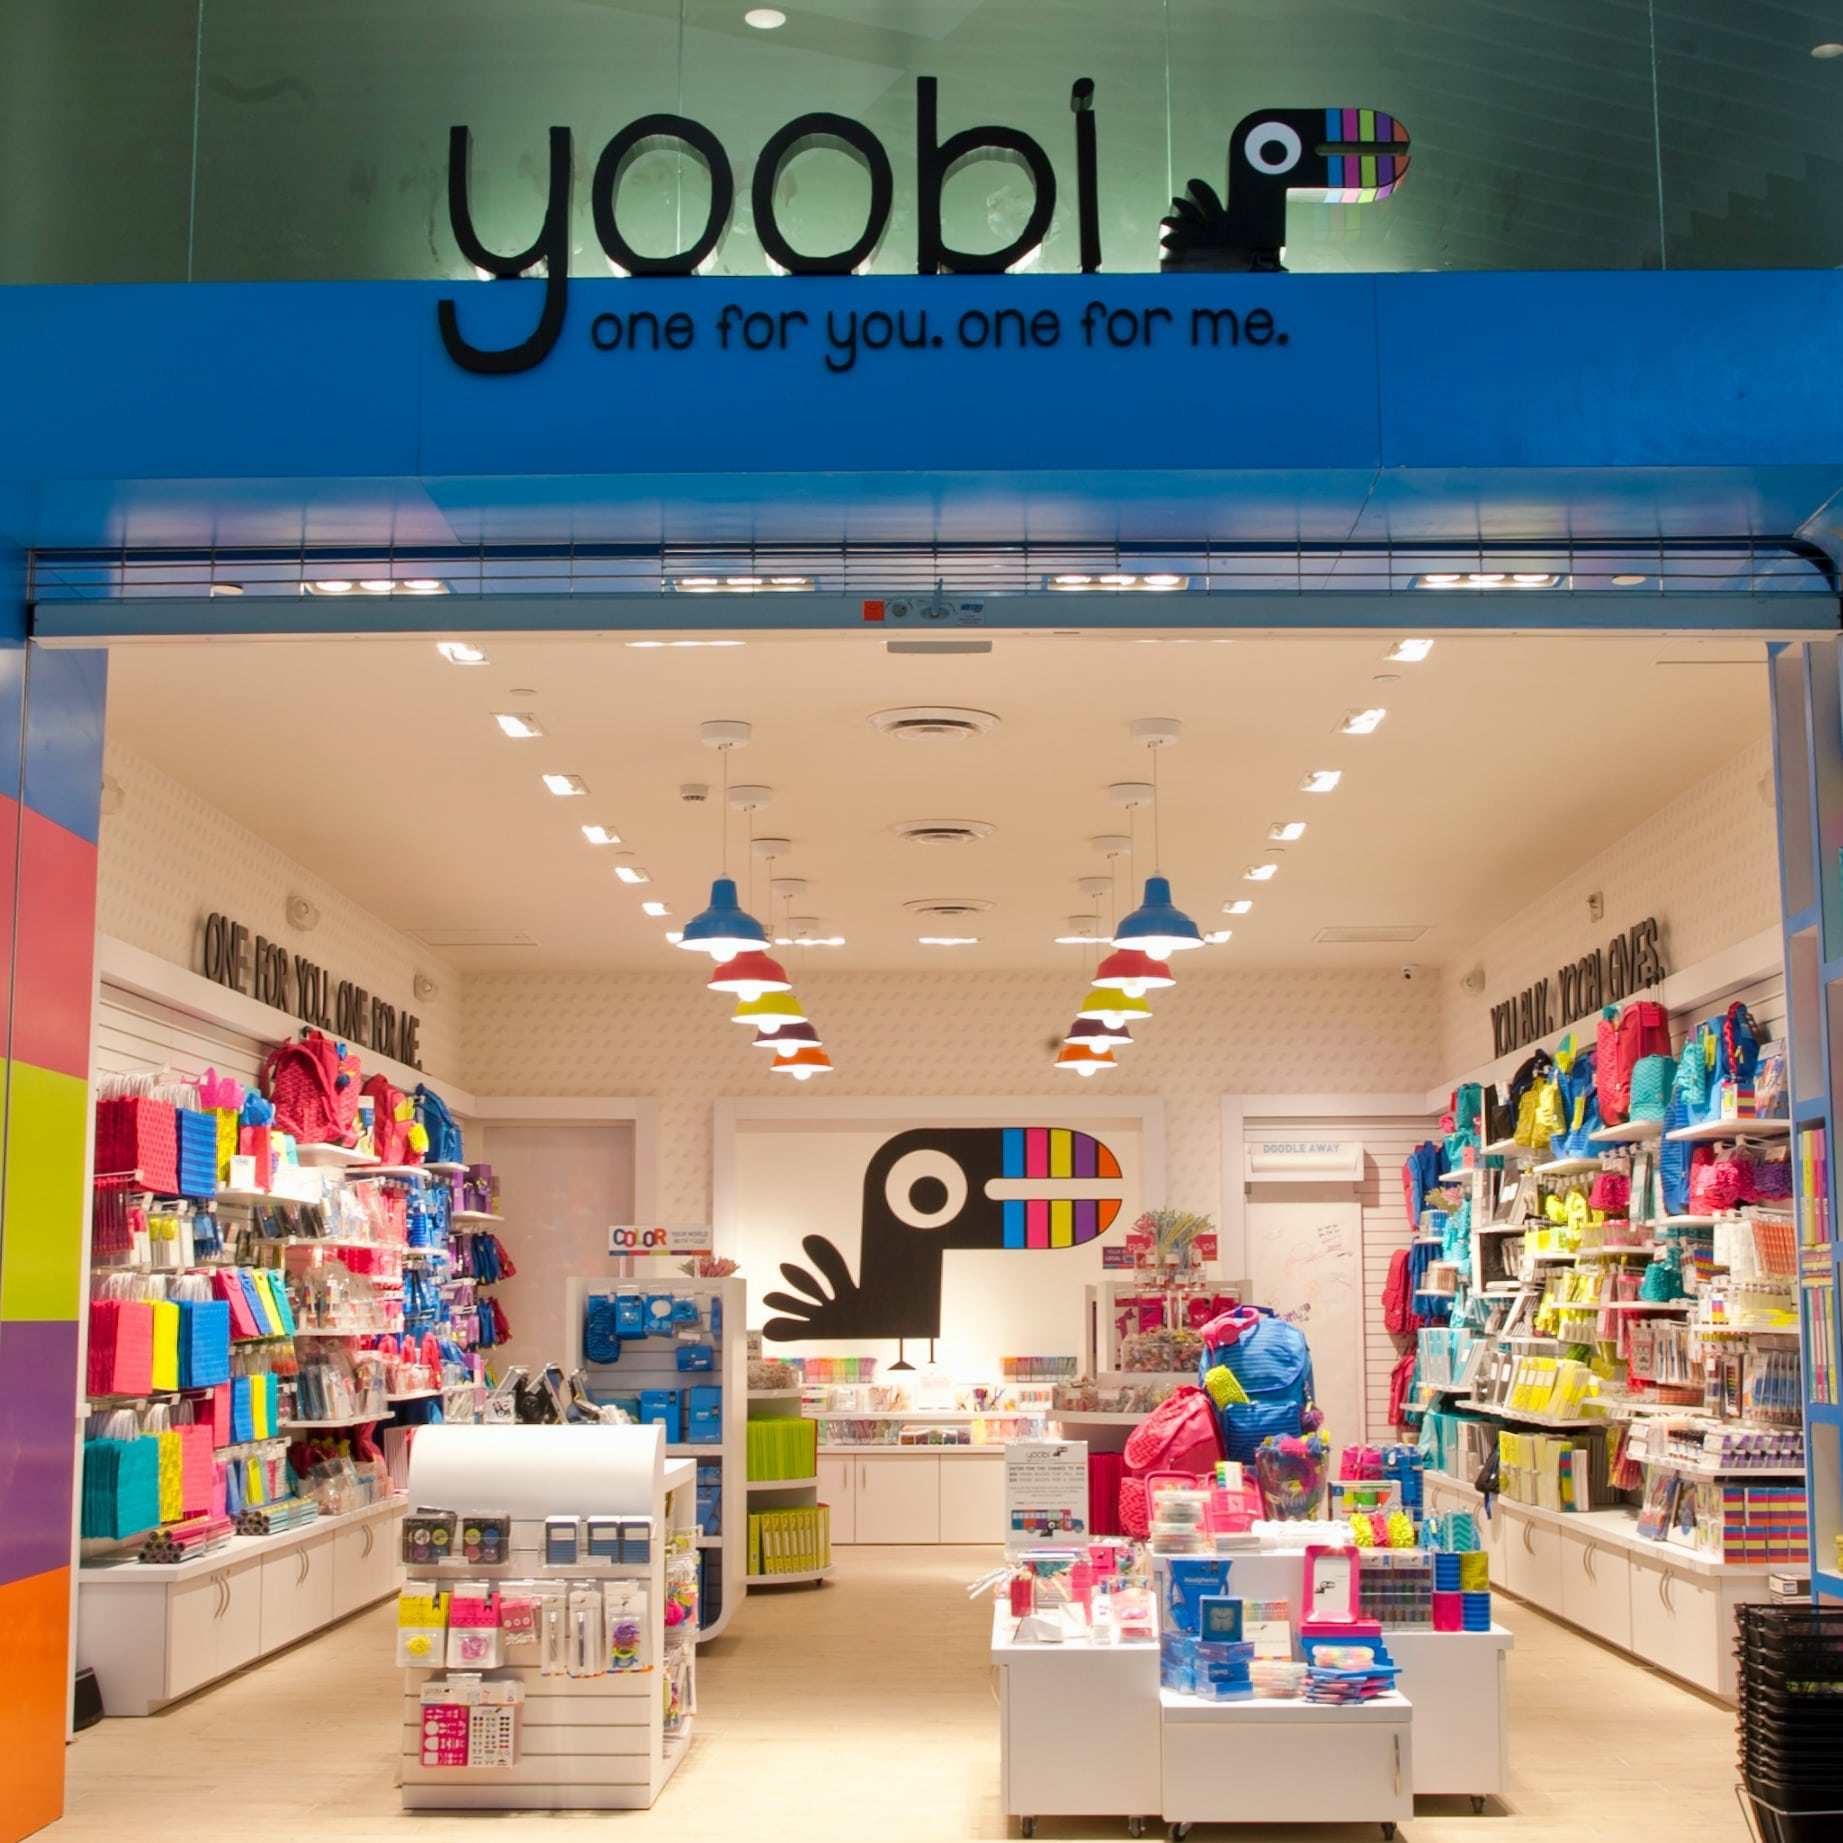 fun ideas for kids yoobi store_square